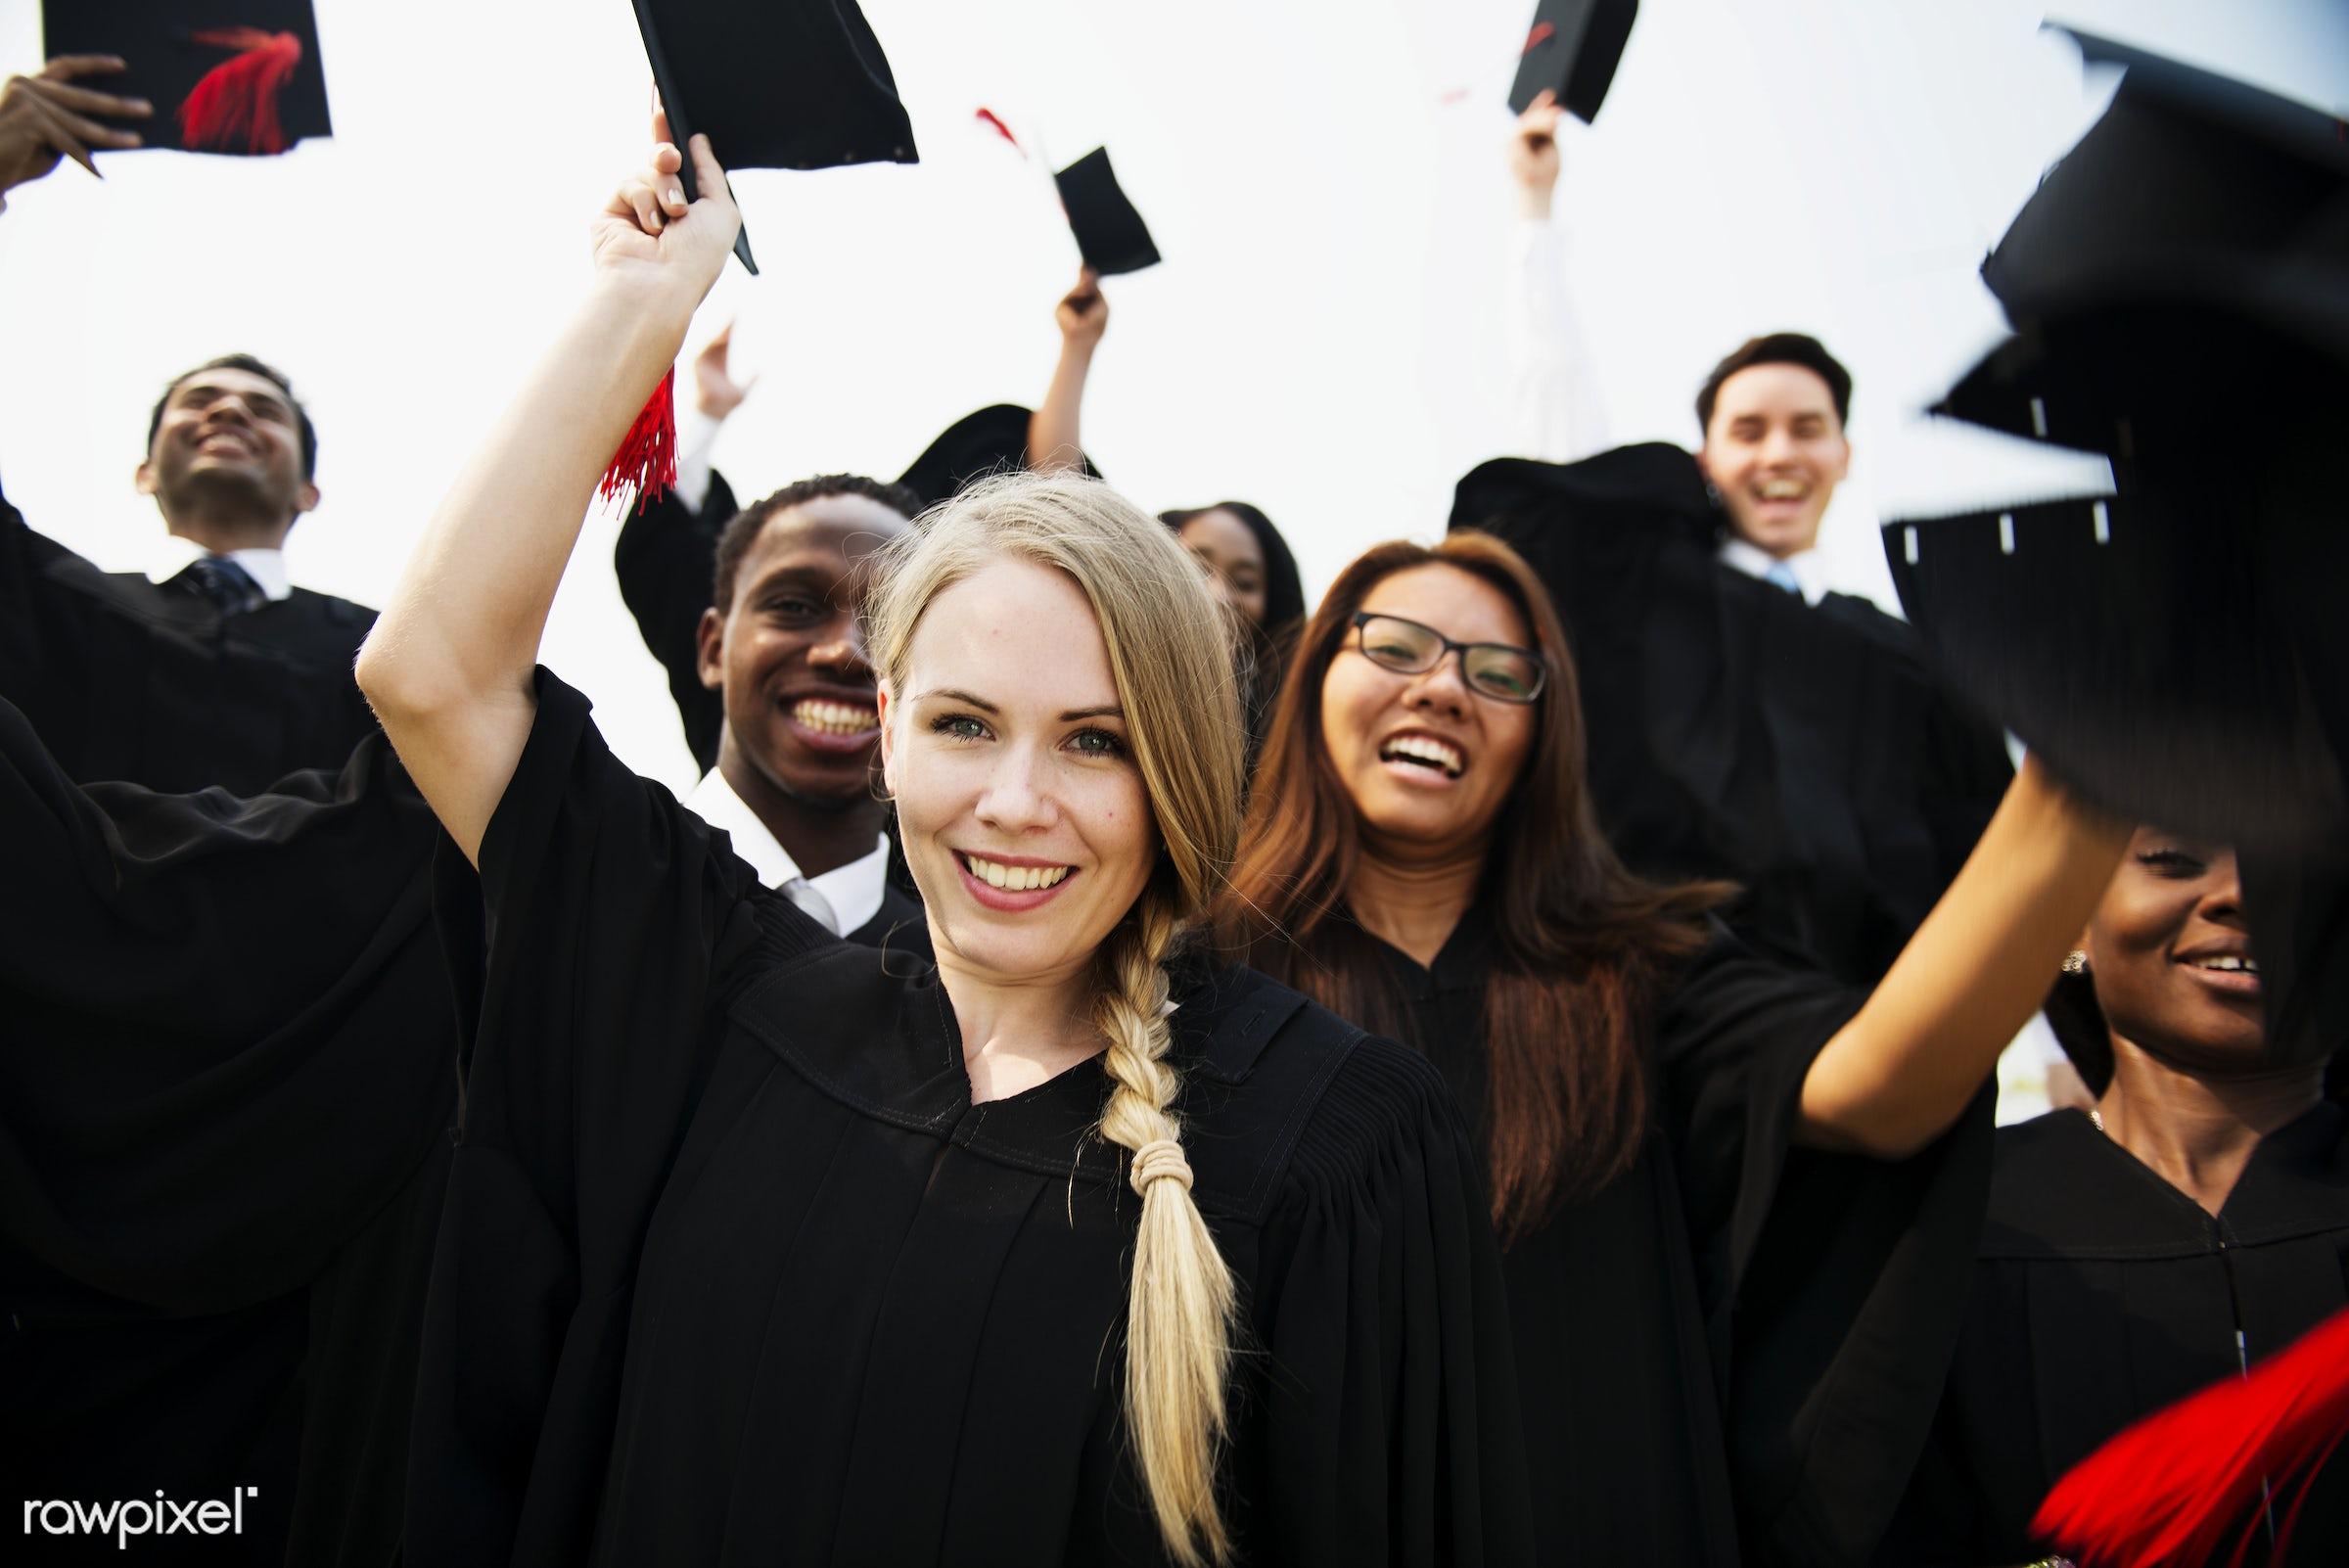 Group of diverse graduating students - achievement, african, alumni, asian, best friends, caucasian, celebrate, celebration...